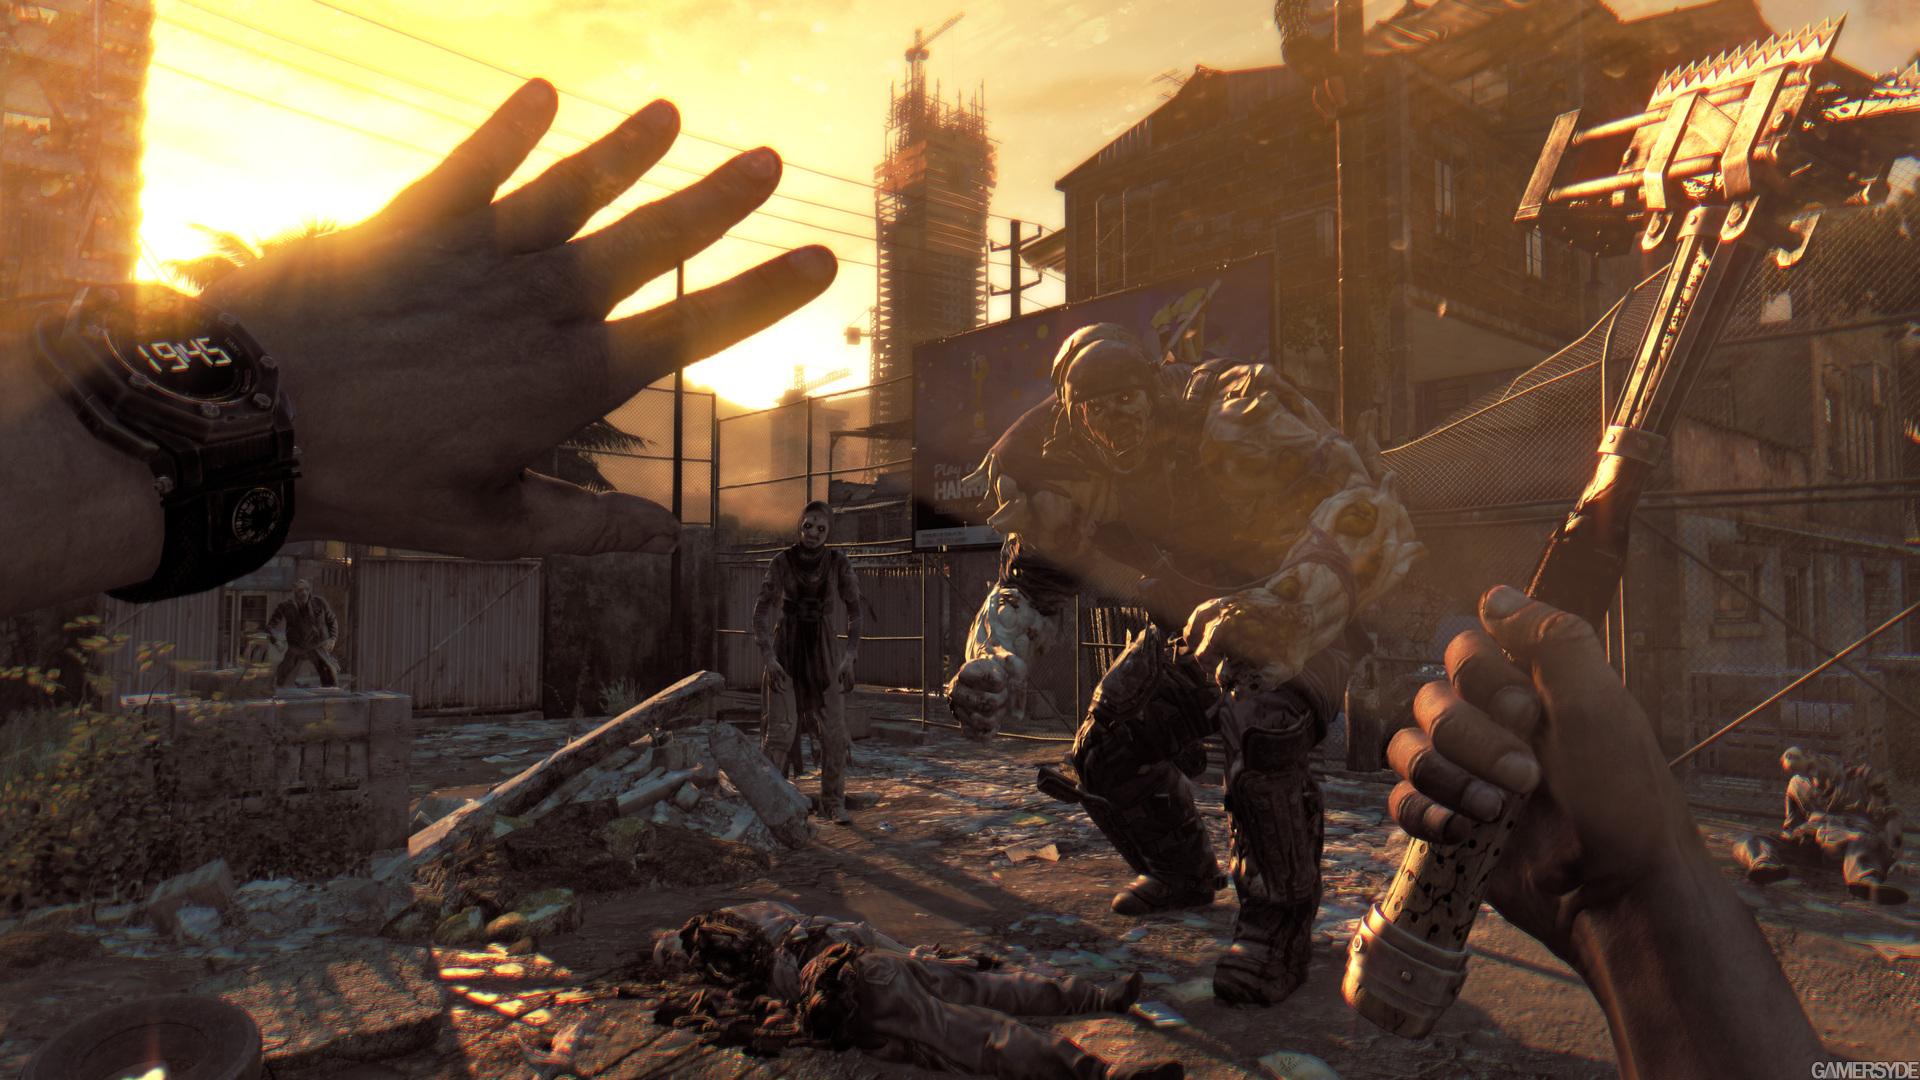 GAMESCOM 2013:اسکرین شاتهای جدید بازی Dying Light منتشر شد | www.MihanGame.com